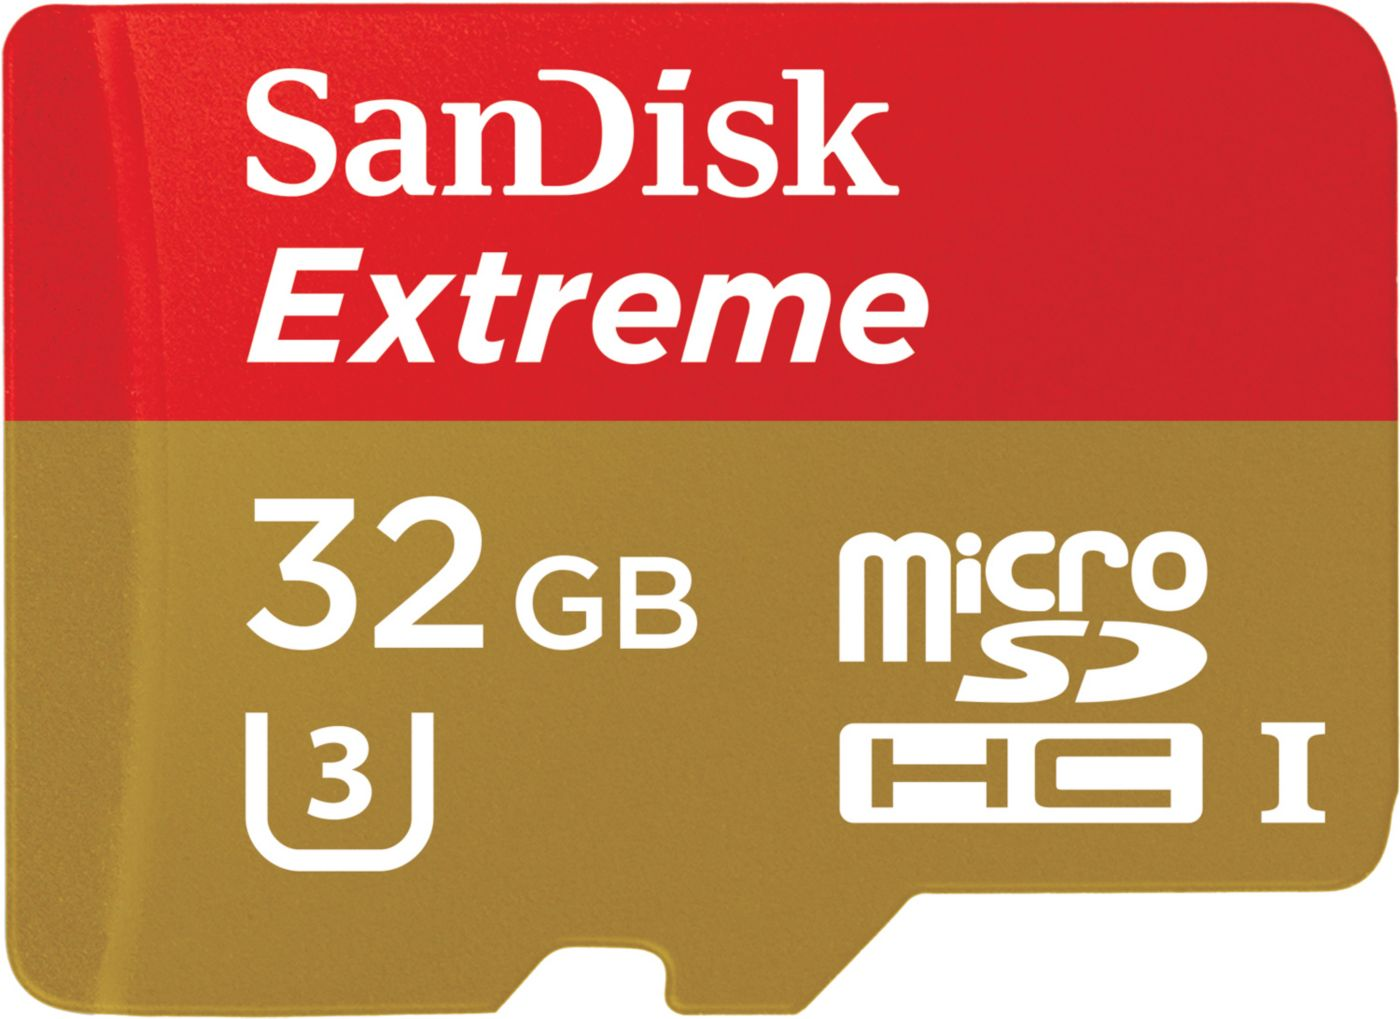 SanDisk Extreme microSDHC 32 GB Memory Card